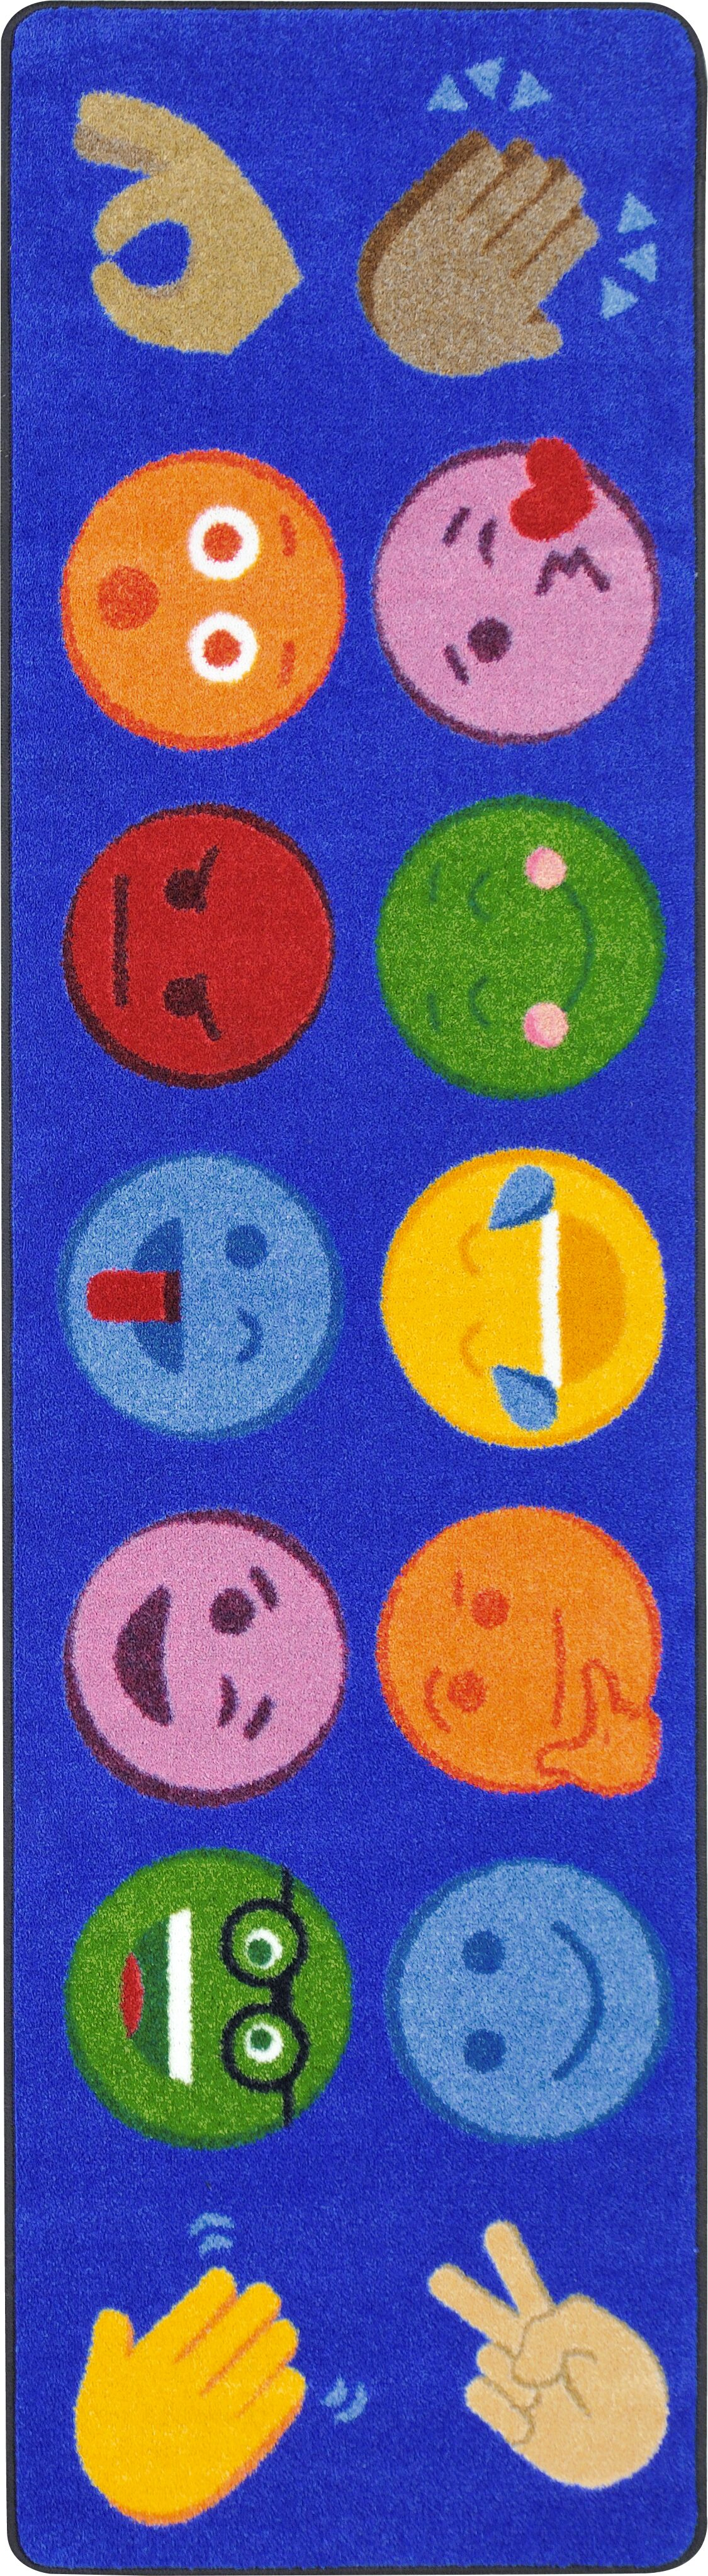 Emoji Expressions Blue Area Rug Rug Size: 7'8